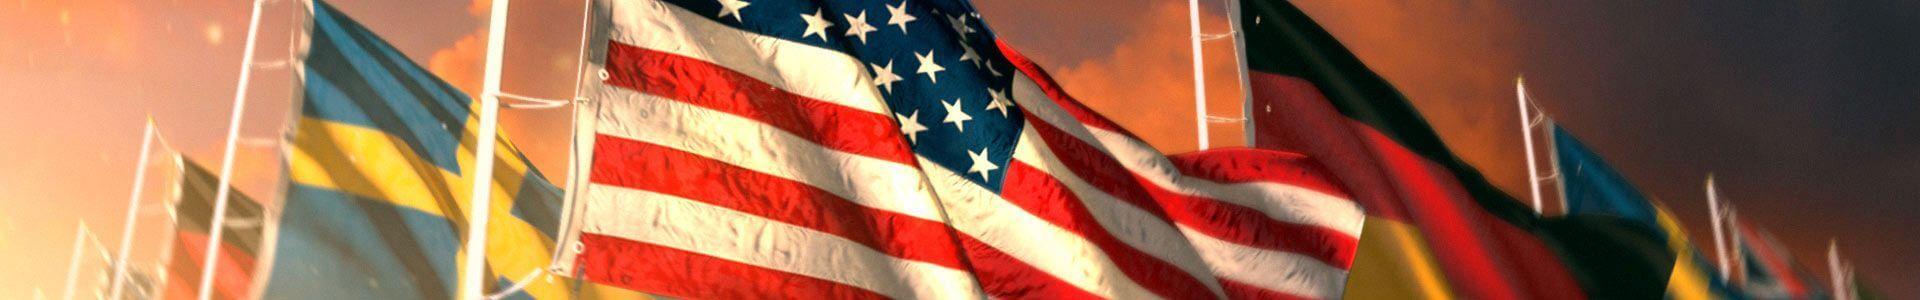 flag_day_0619_1920x300_s